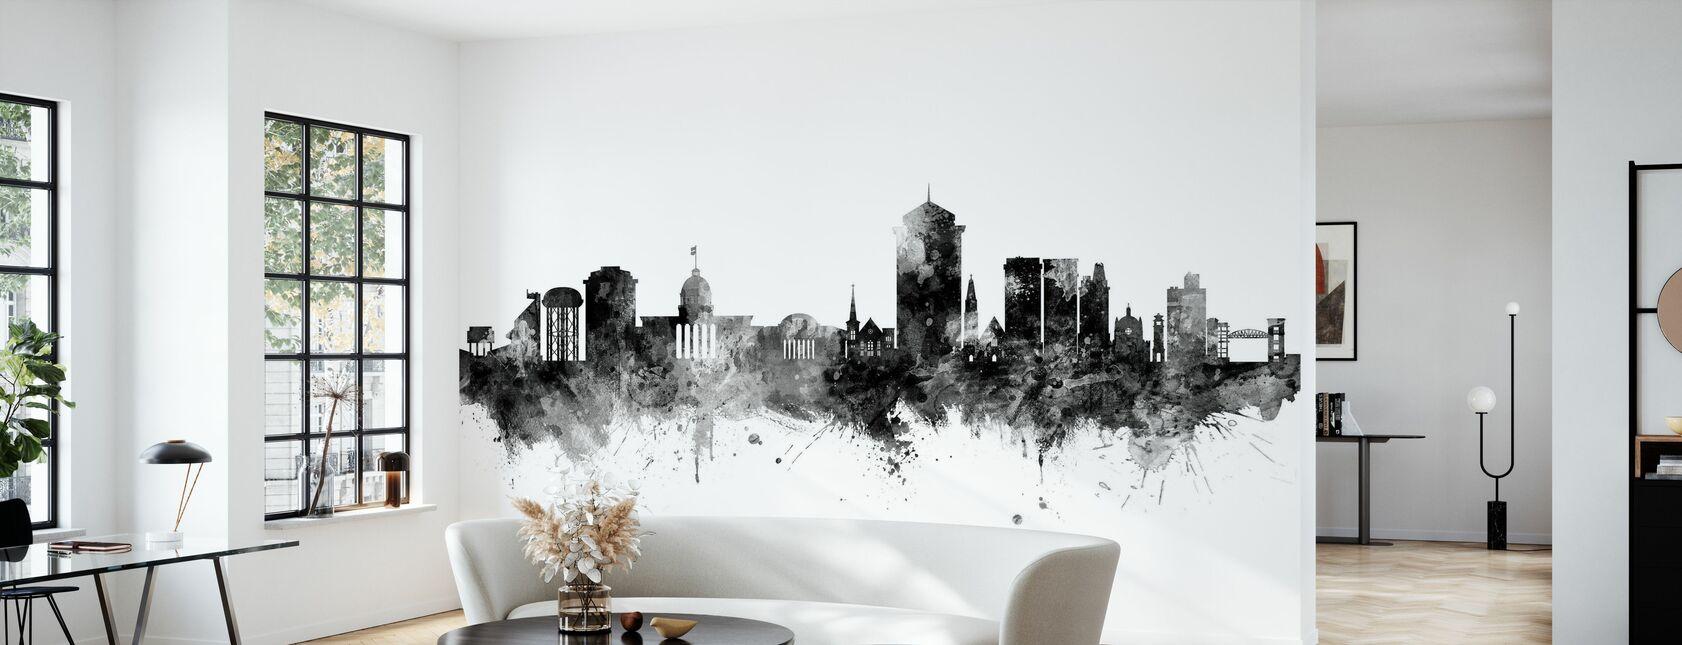 Montgomery Alabama Skyline - Wallpaper - Living Room